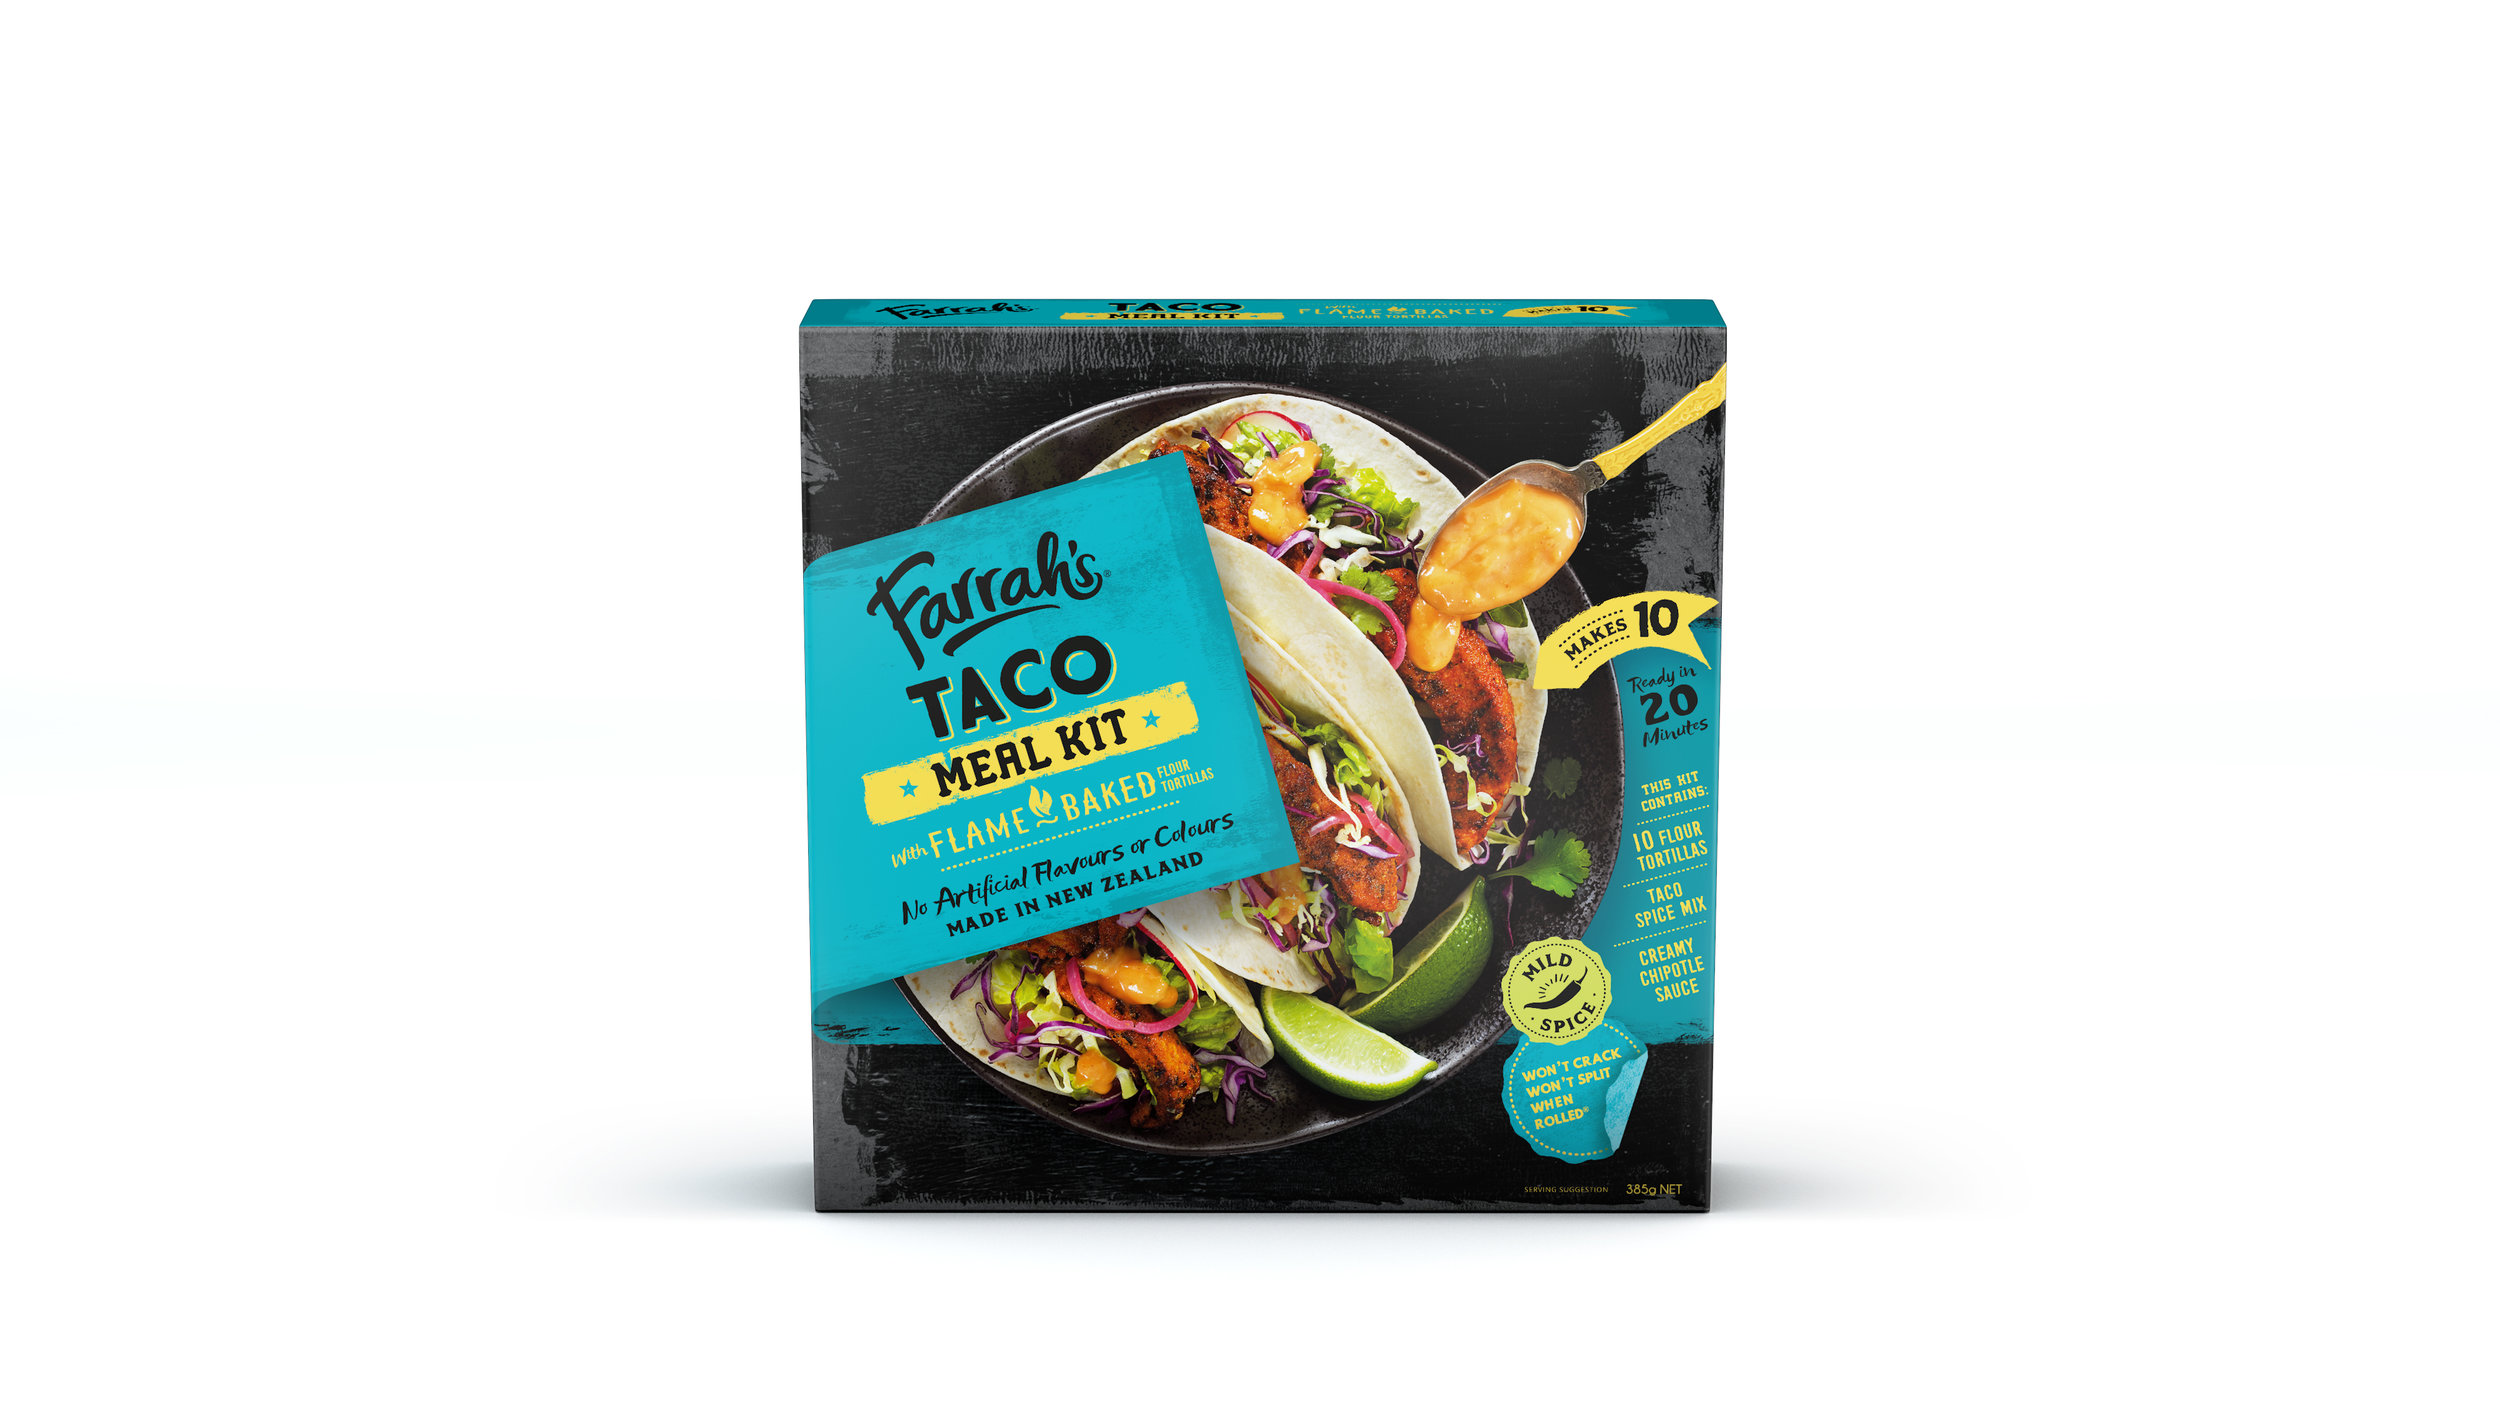 Taco Render v1a small.jpg